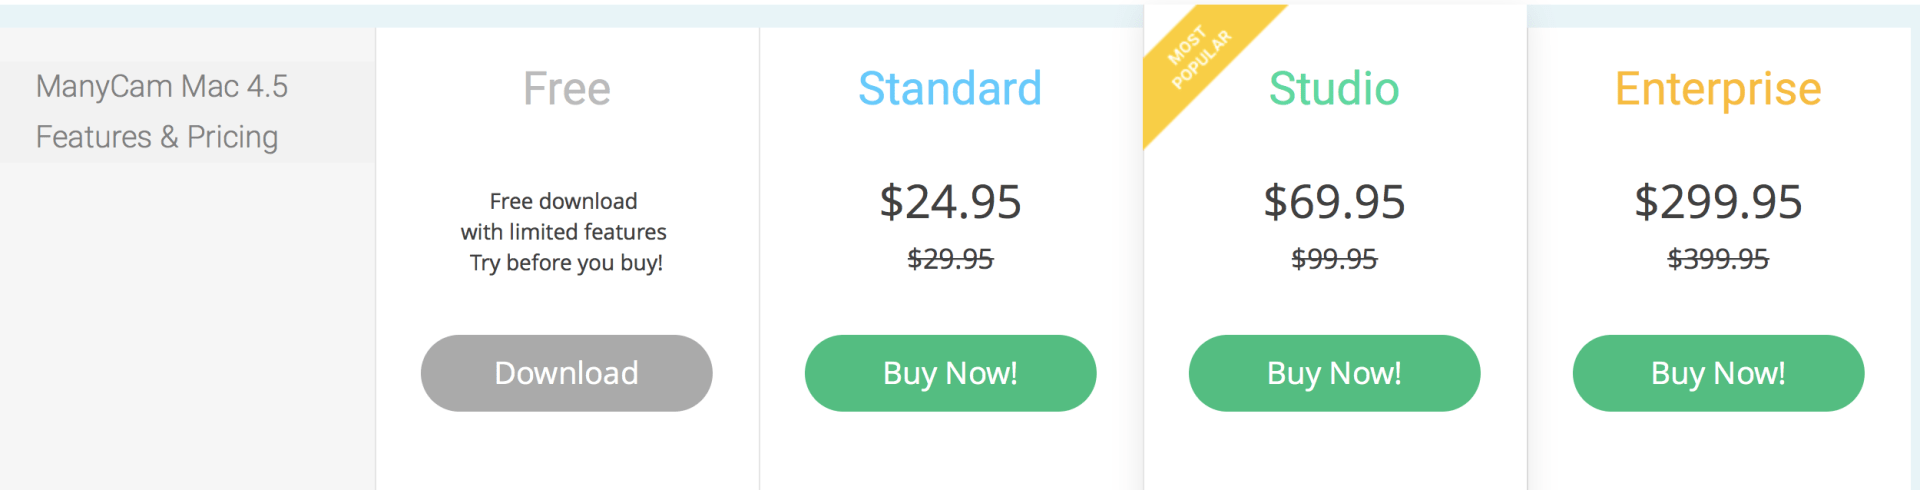 manycam price